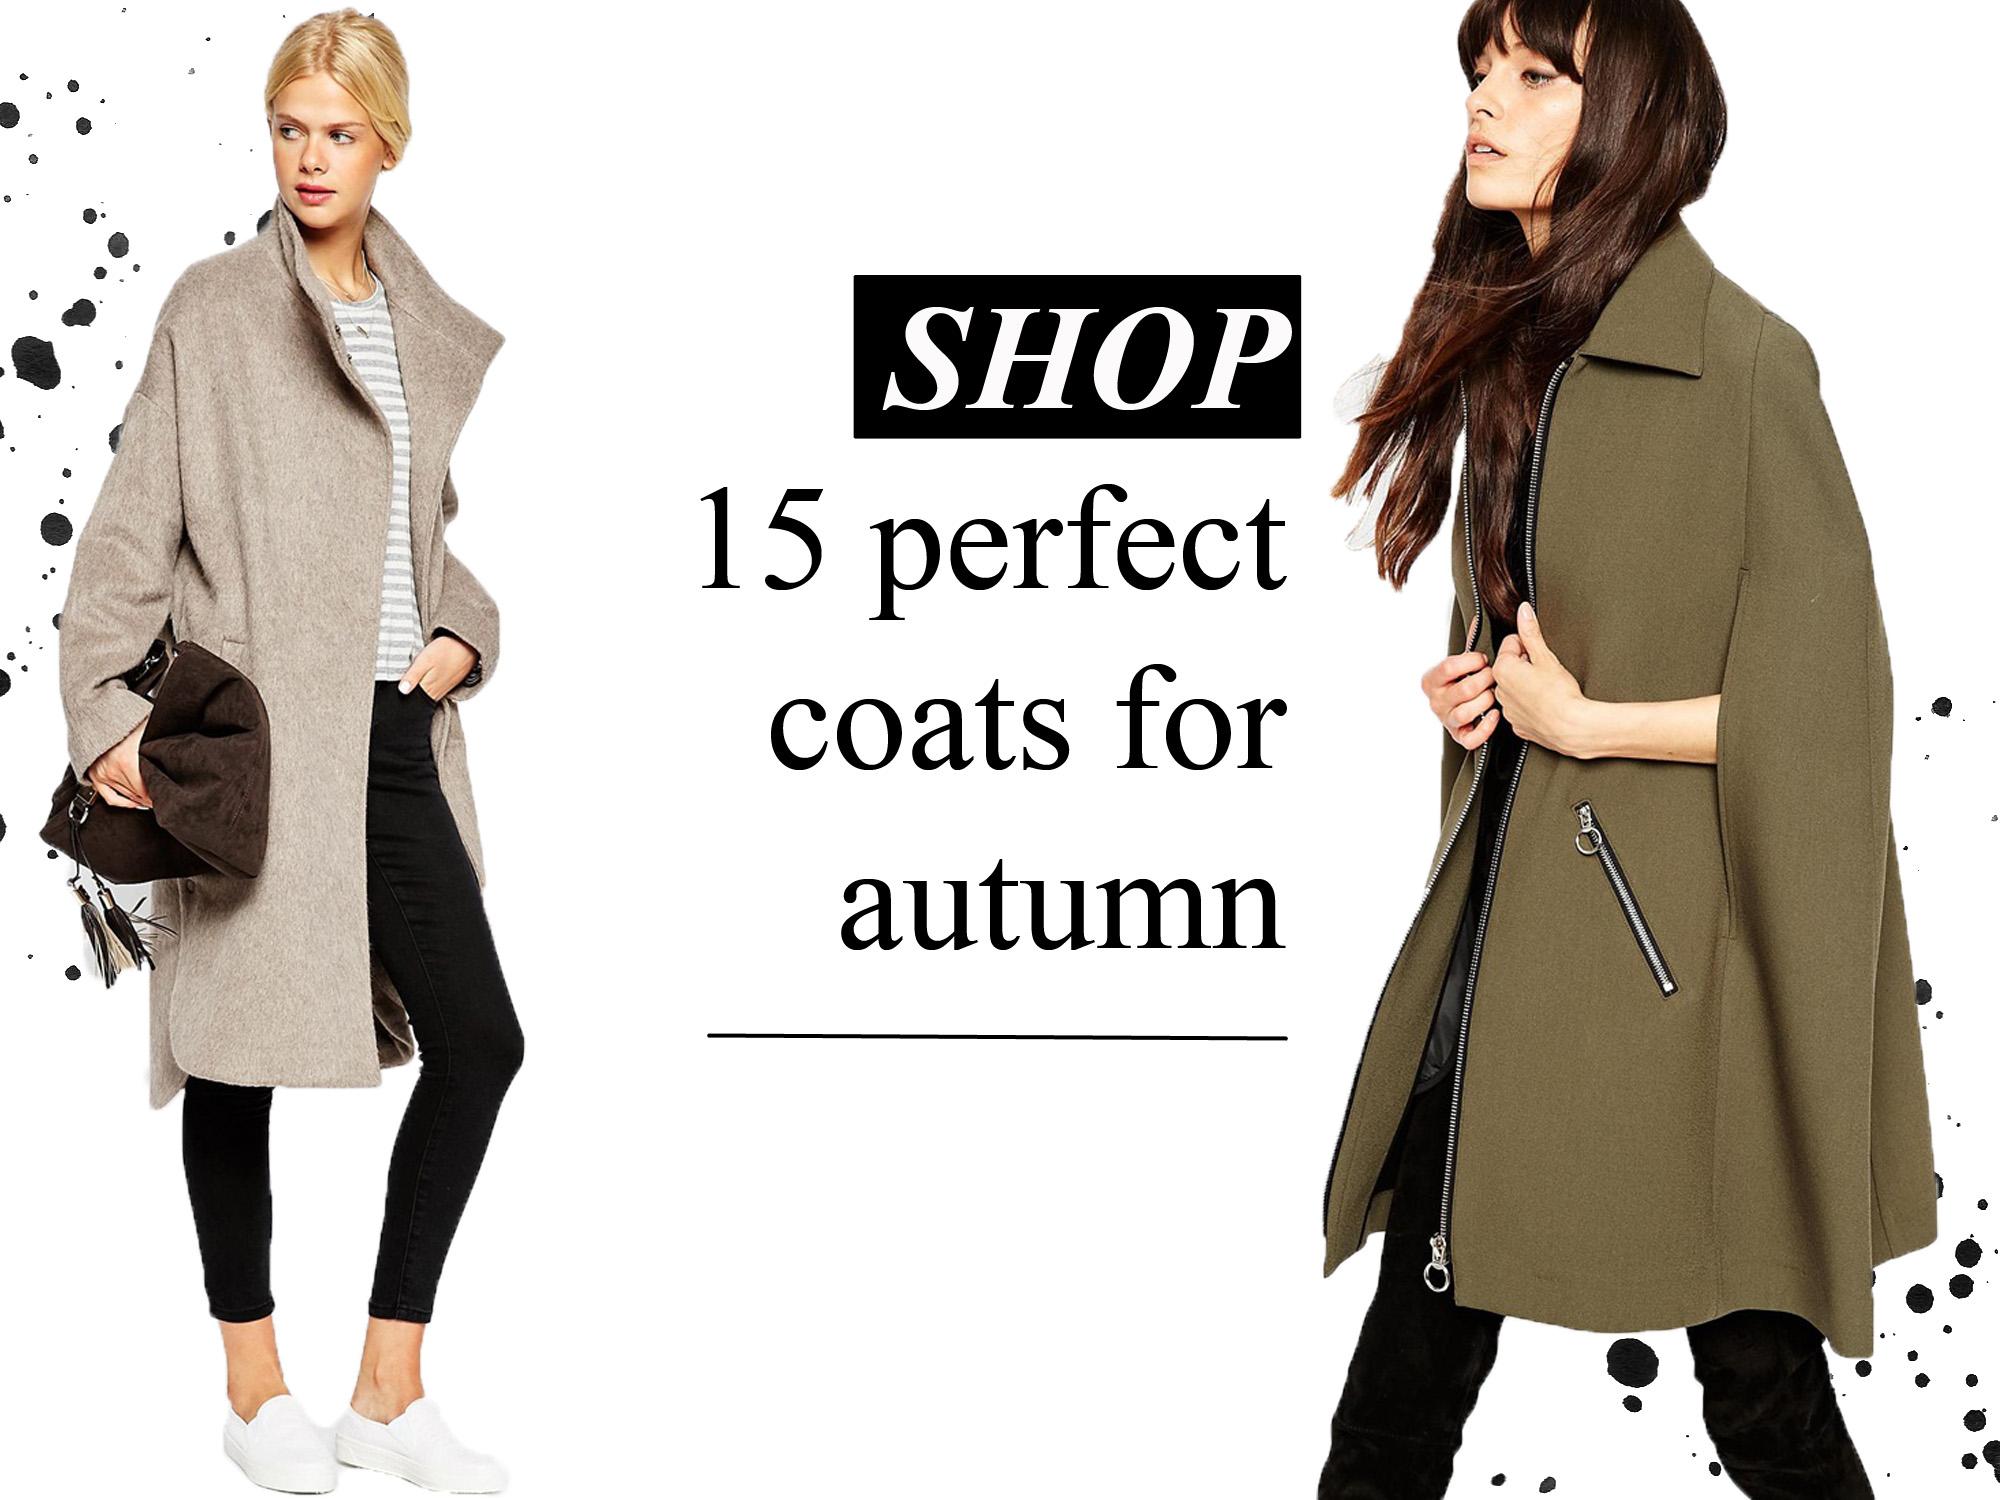 Autumn Coats: 15 Under 250 EuroAutumn Coats: 15 Under 250 Euro15 осенних курток и пальто до 250 евро